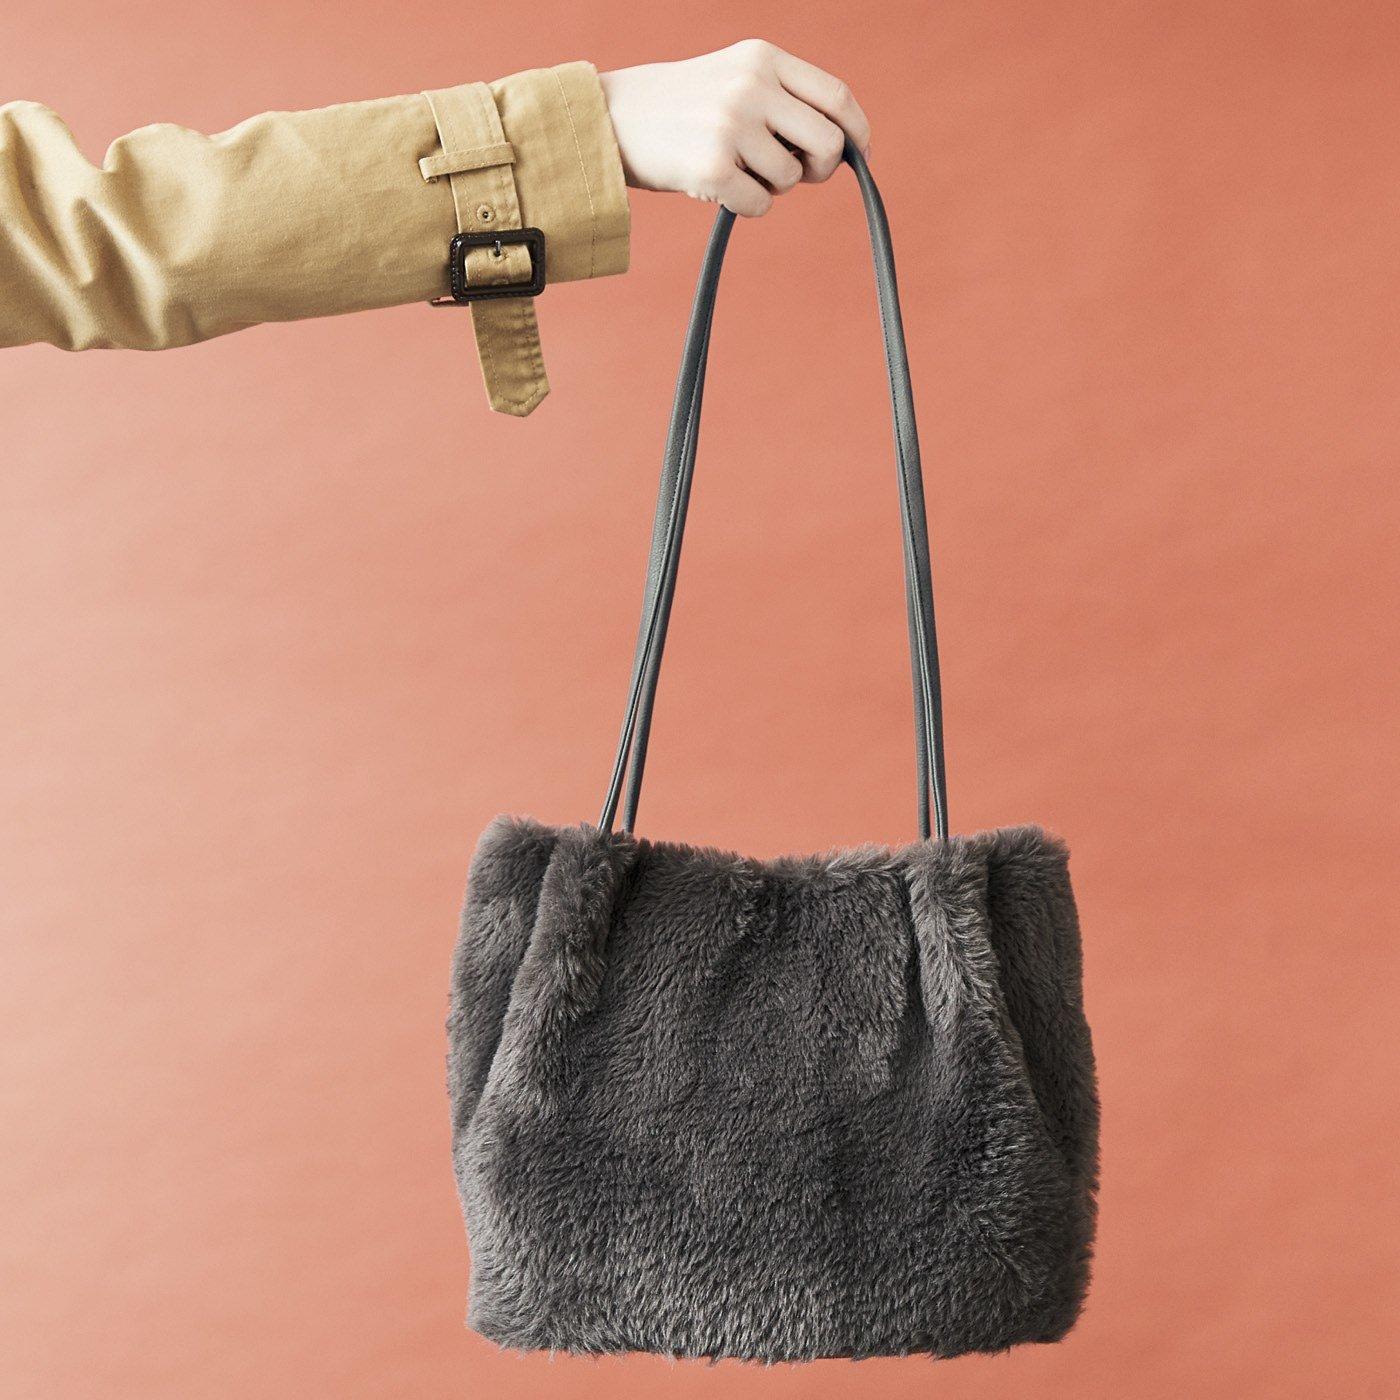 UP.de ふわふわの手ざわりに癒やされる 大人グレーのファーショルダートートバッグ